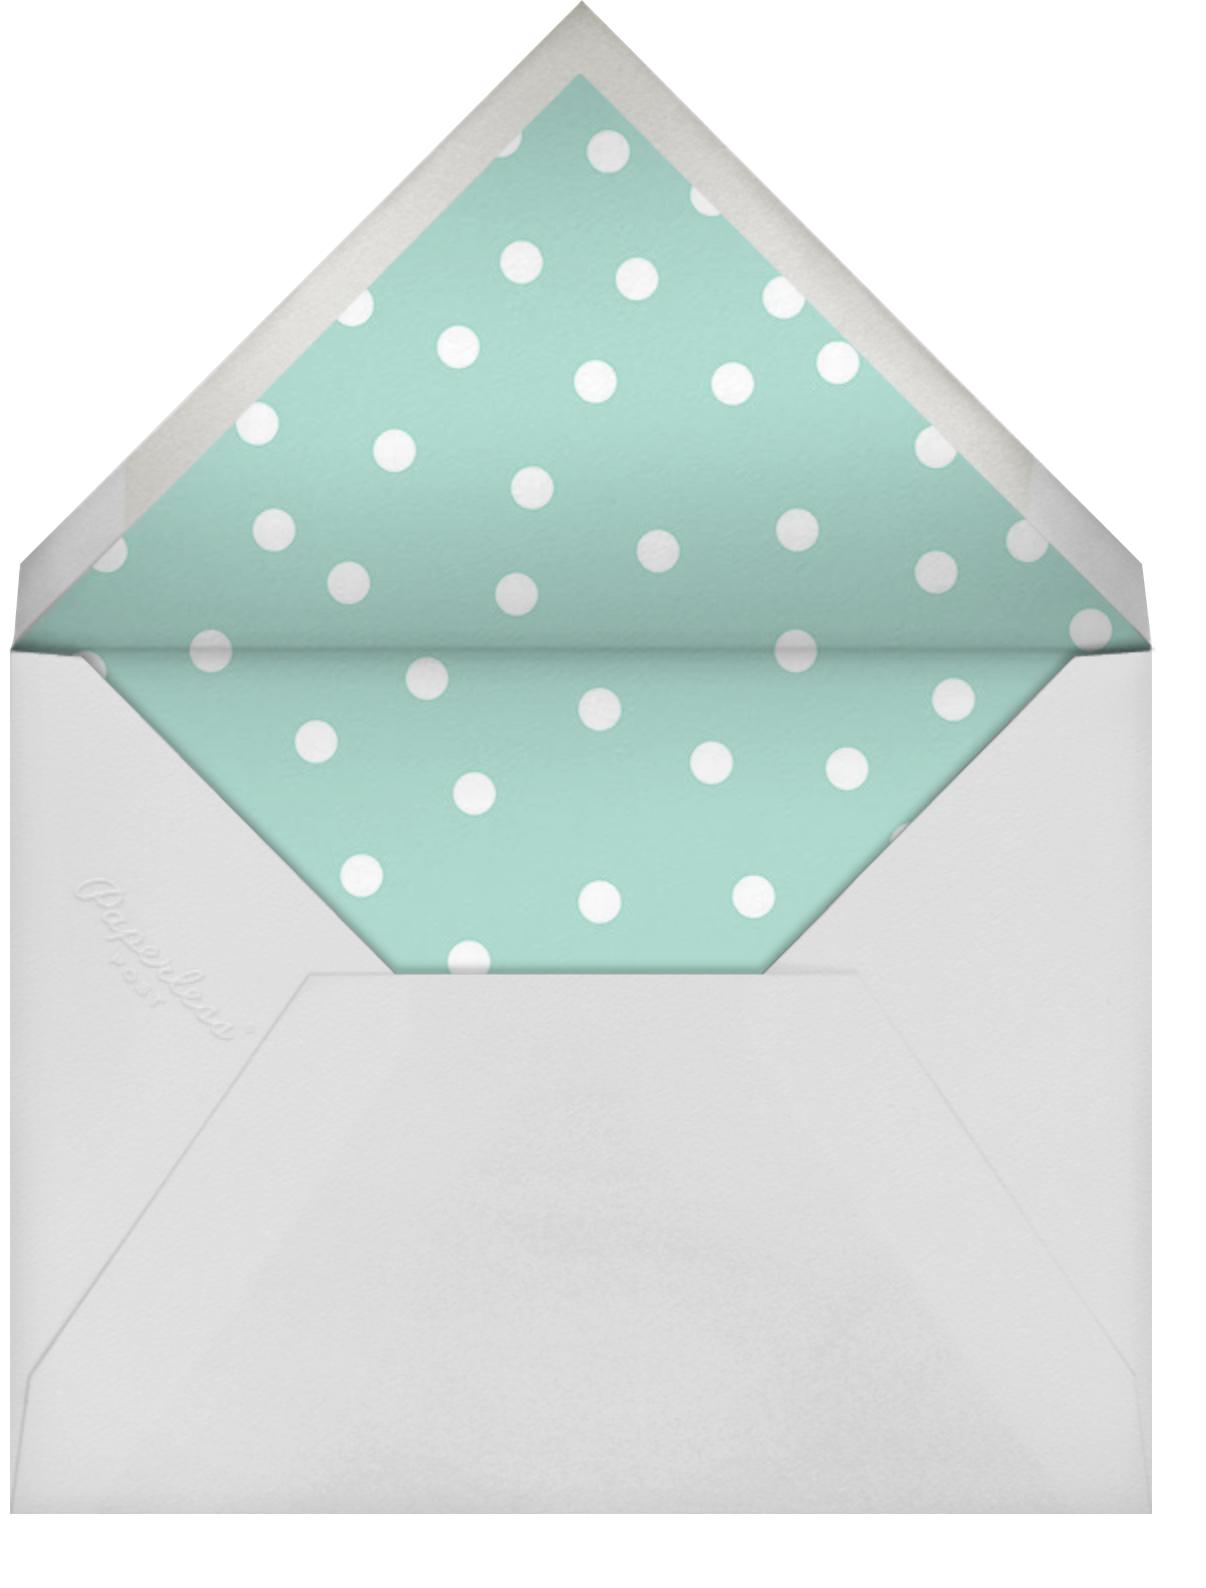 Form a Line - Linda and Harriett - Baby shower - envelope back